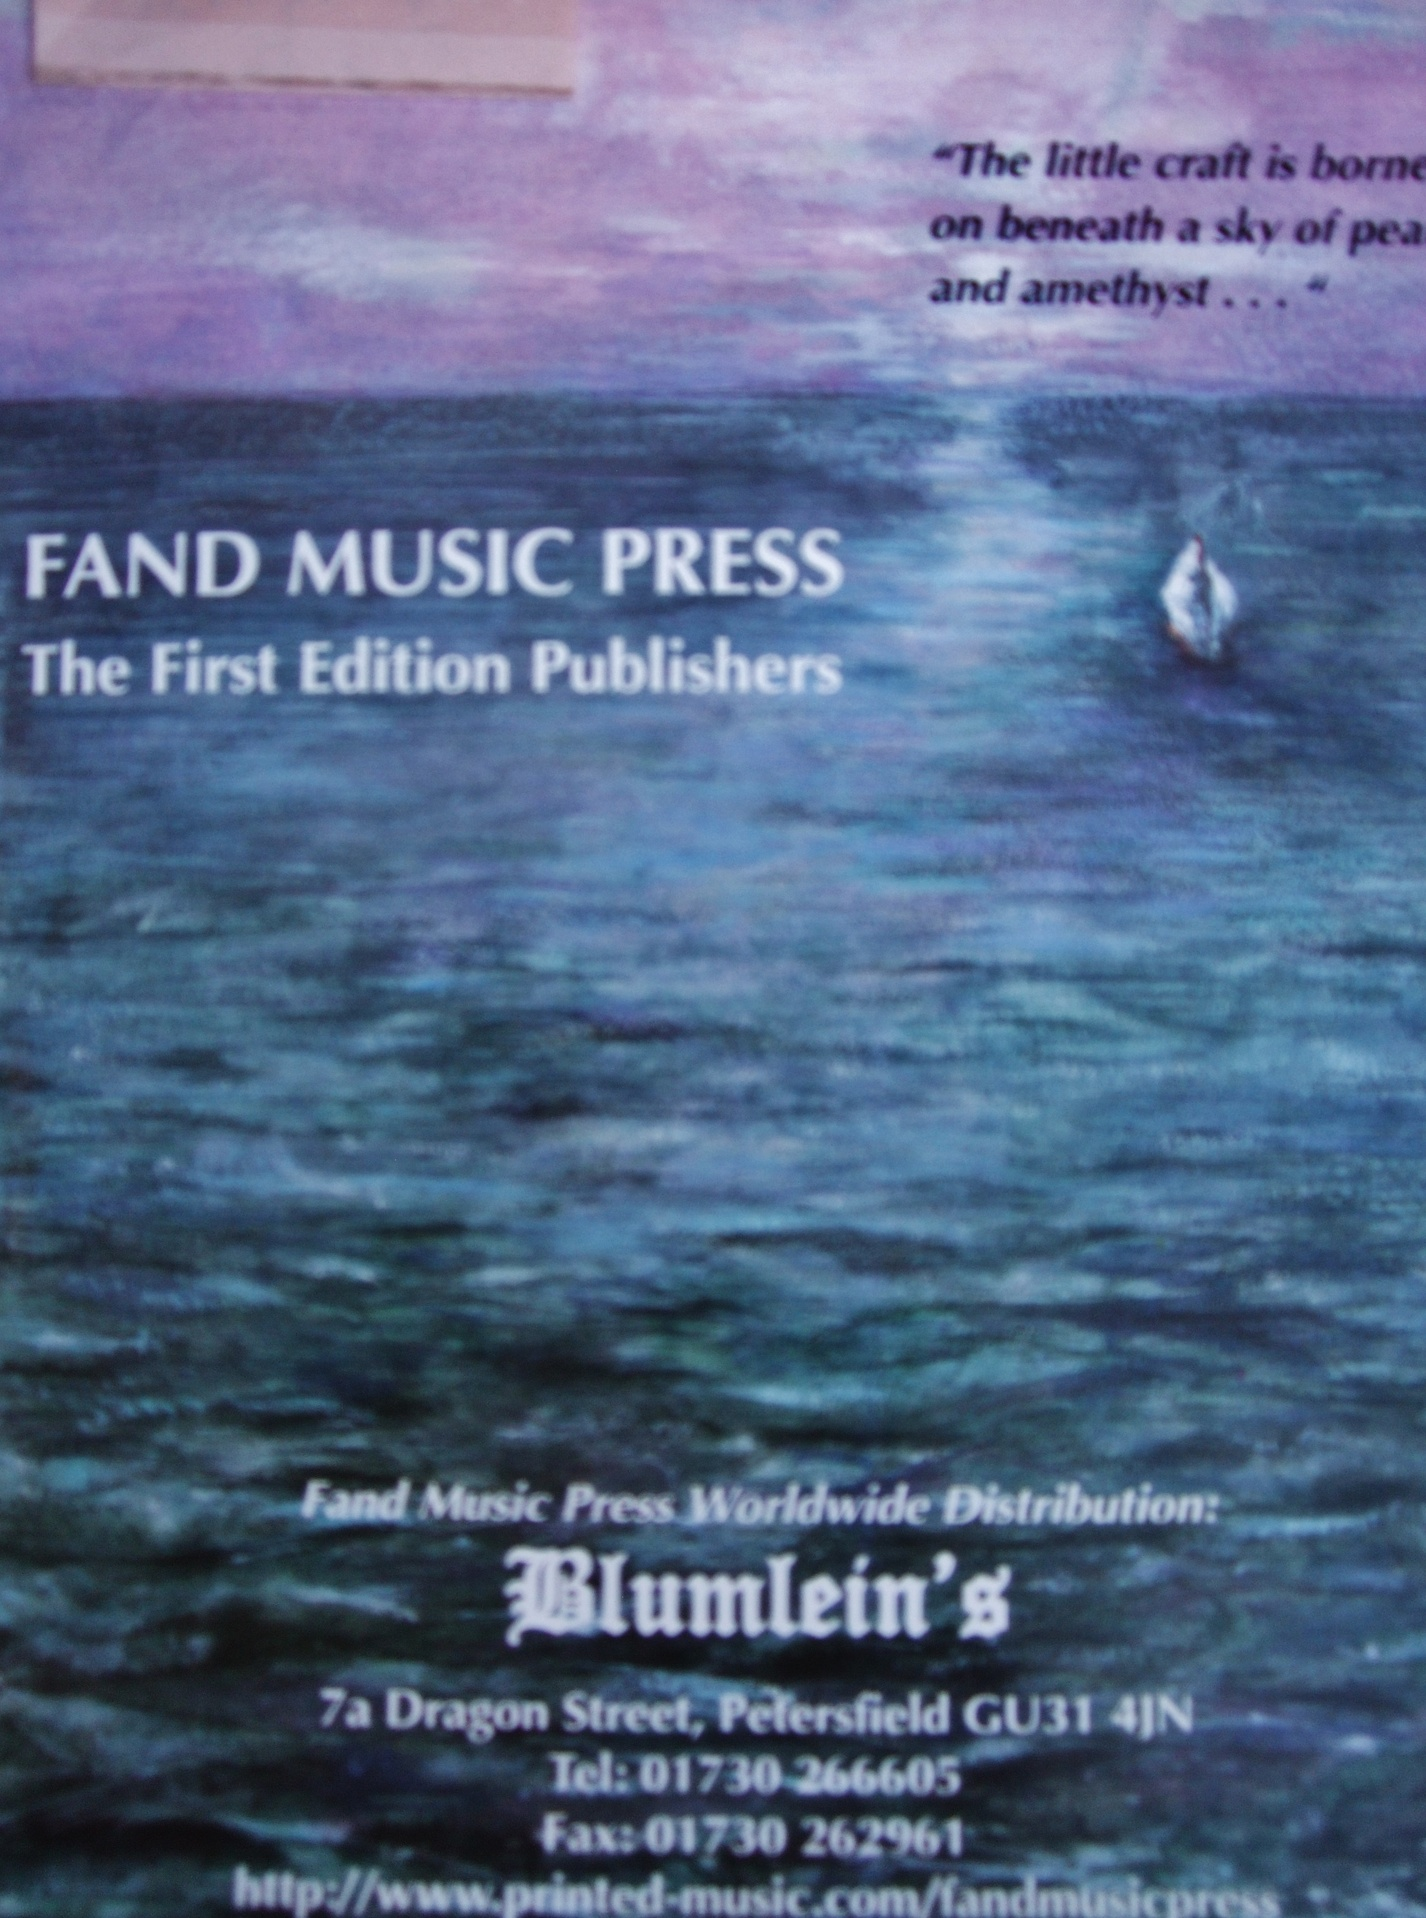 Fand Music Press.